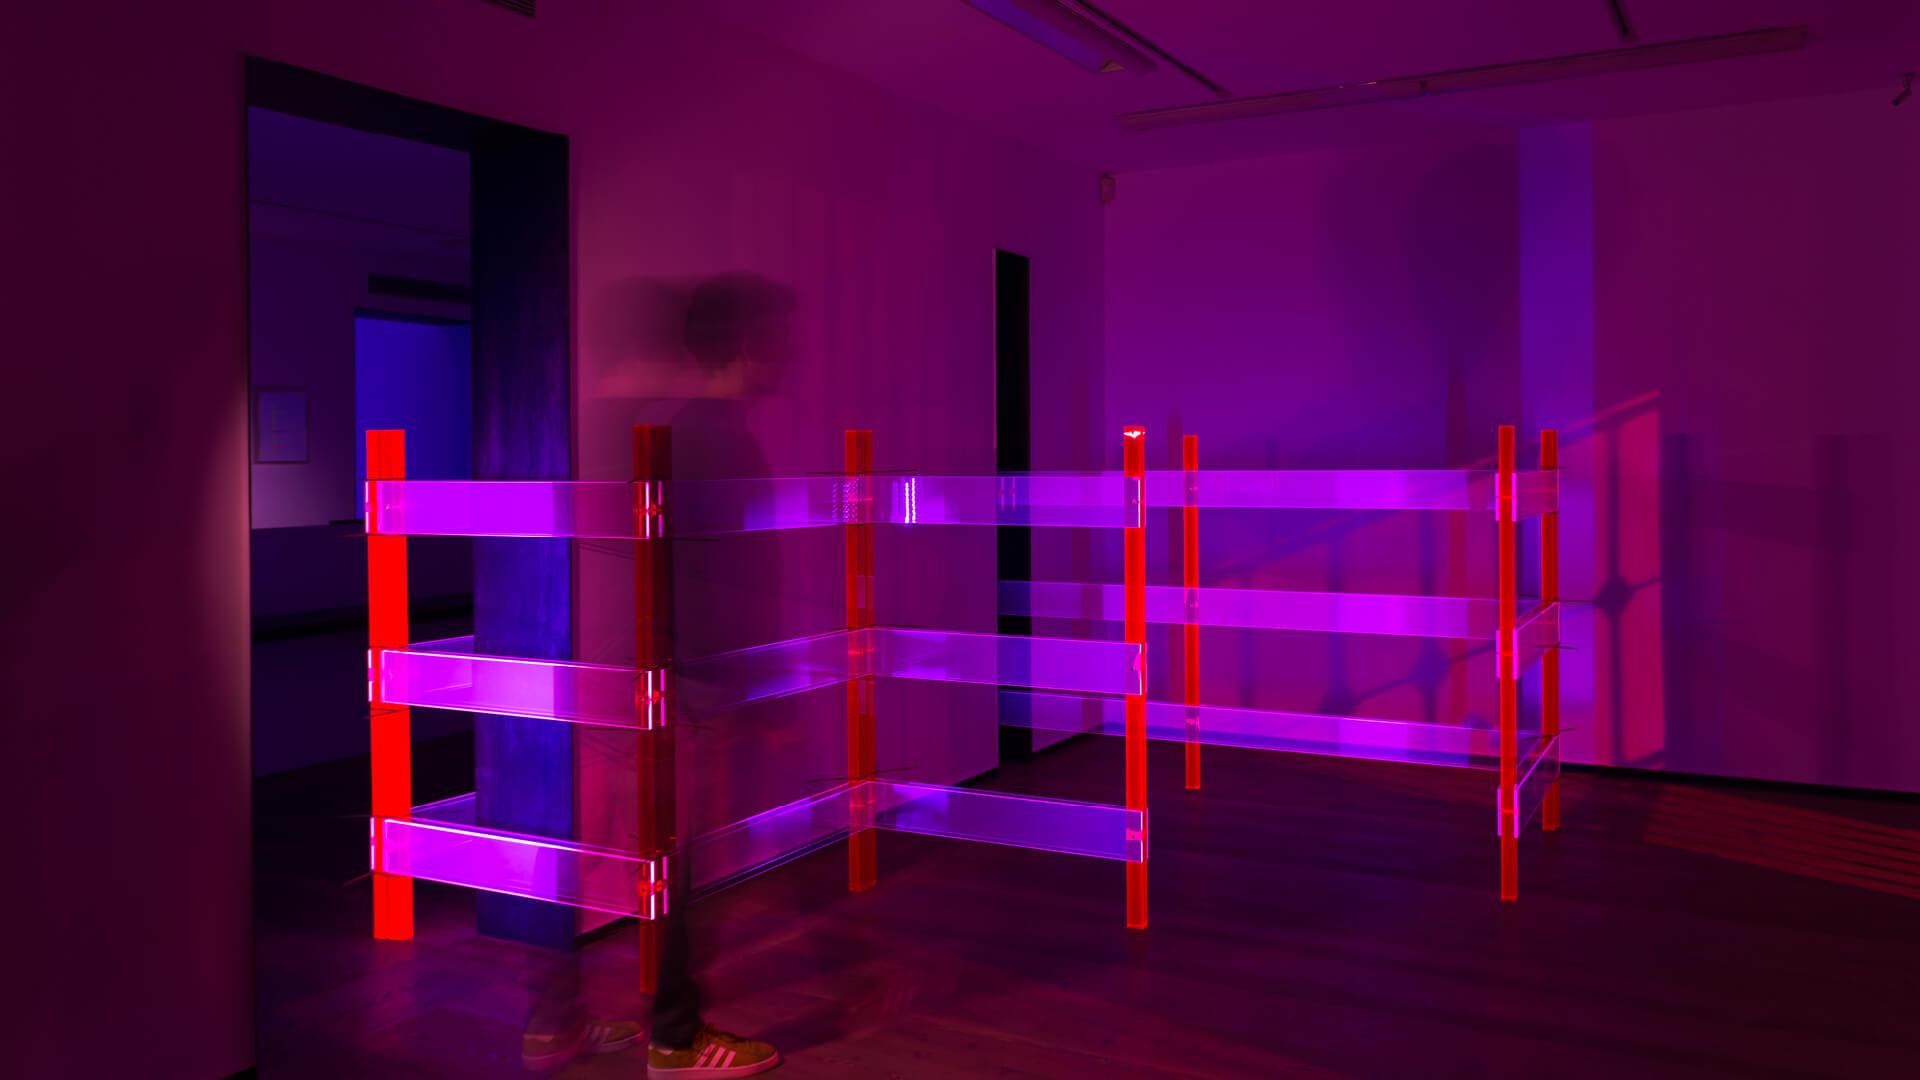 The installation 'Push borders' in black light | Push Borders | Regine Schumann | STIRworld